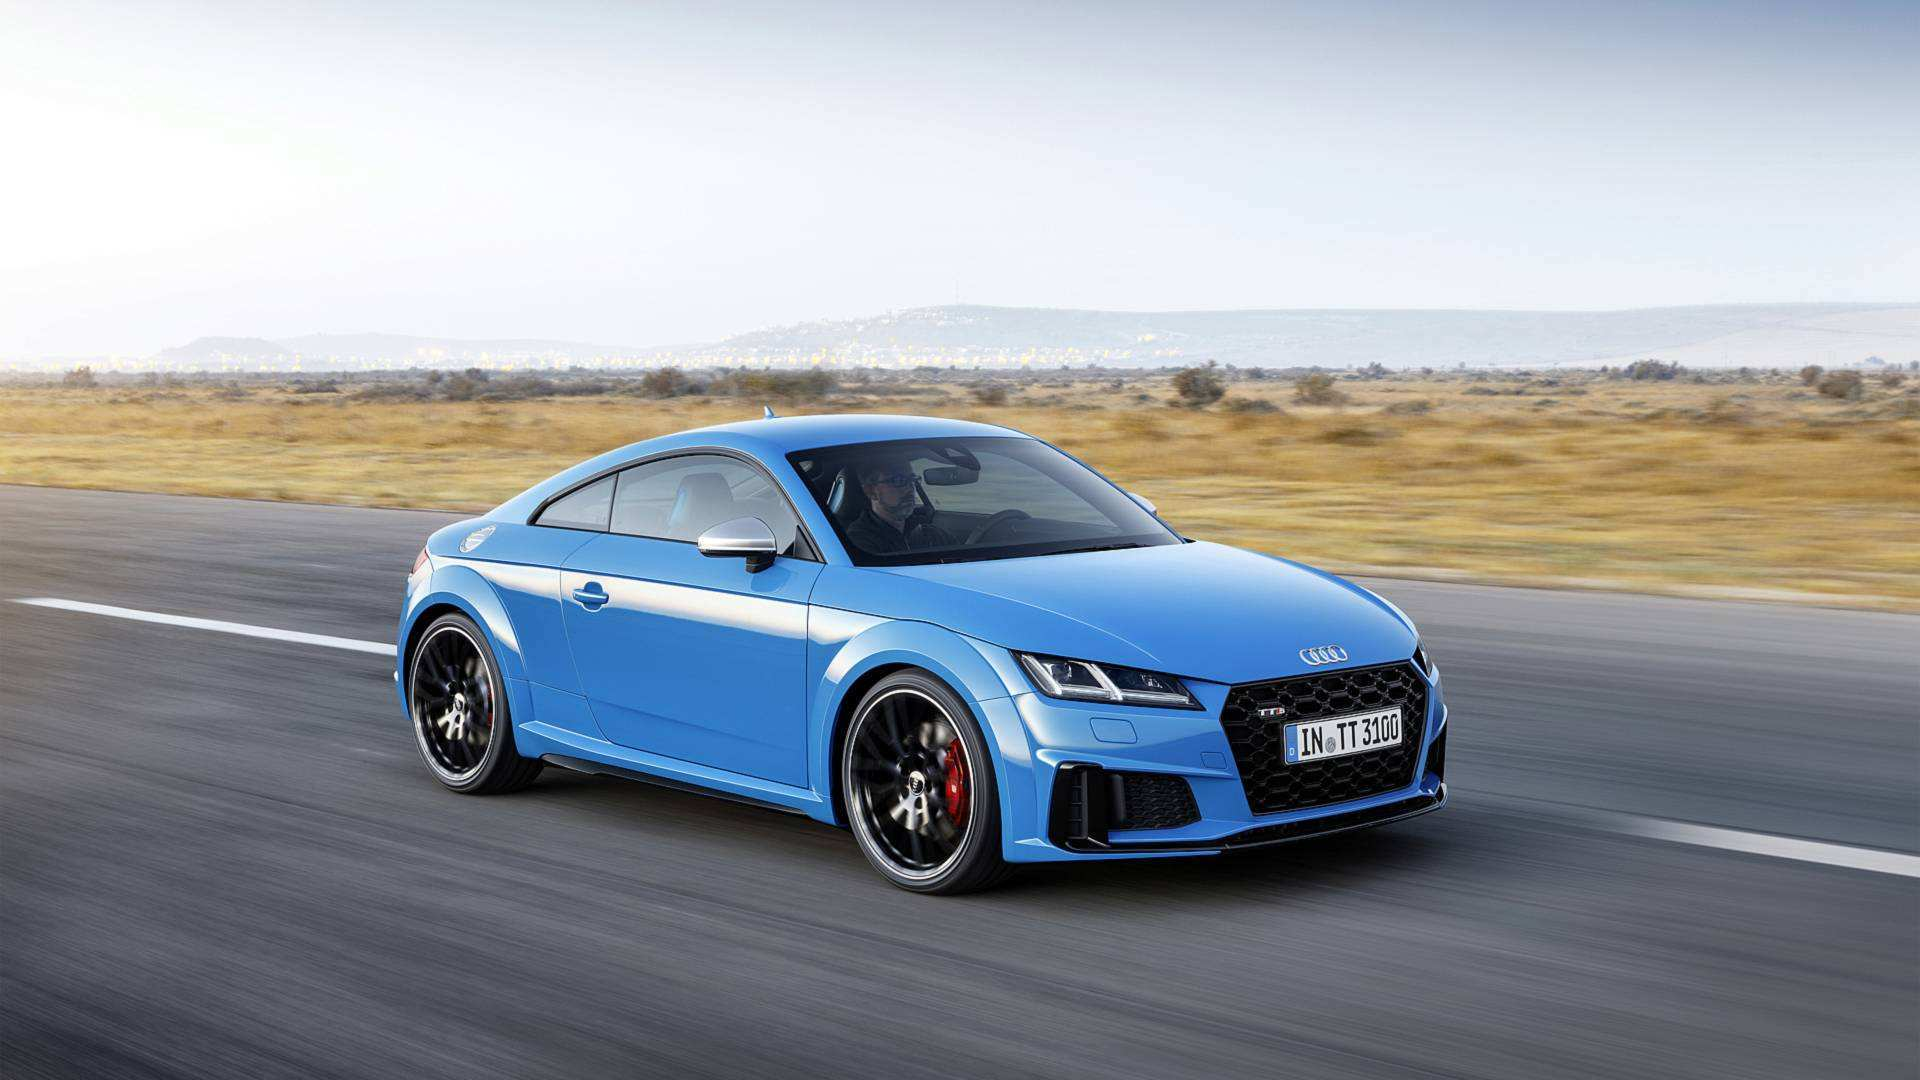 44 Great 2019 Audi Tt Release Date Interior by 2019 Audi Tt Release Date